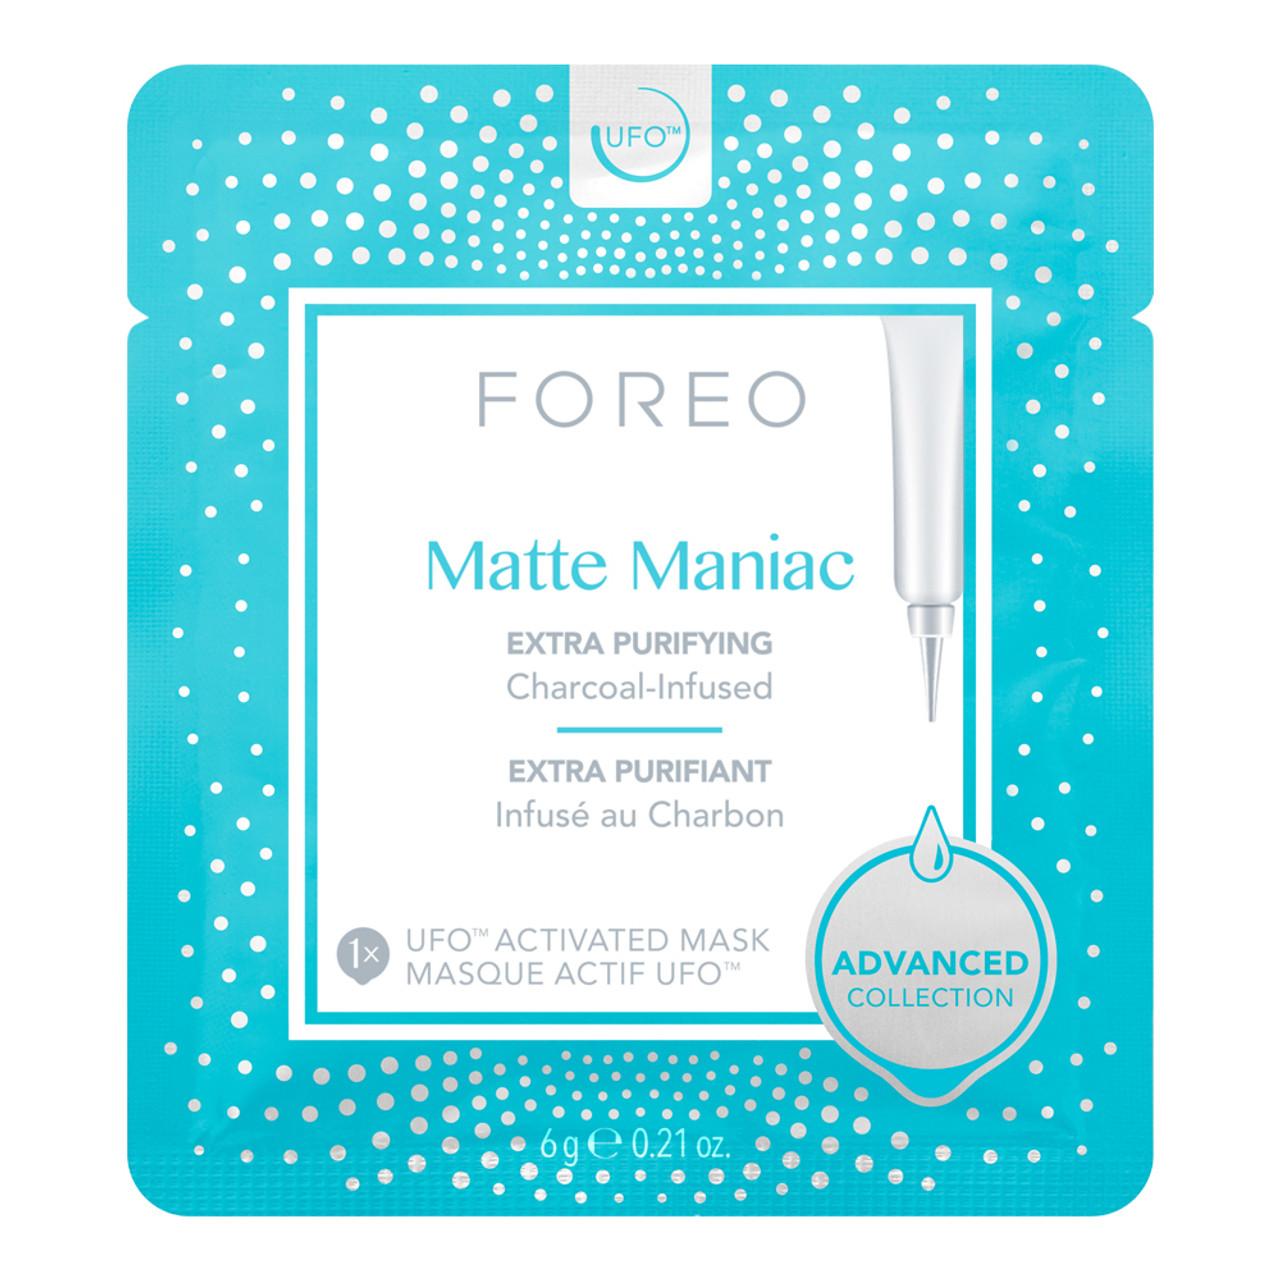 Foreo UFO Activated Masks - Matte Maniac (6-Pk)